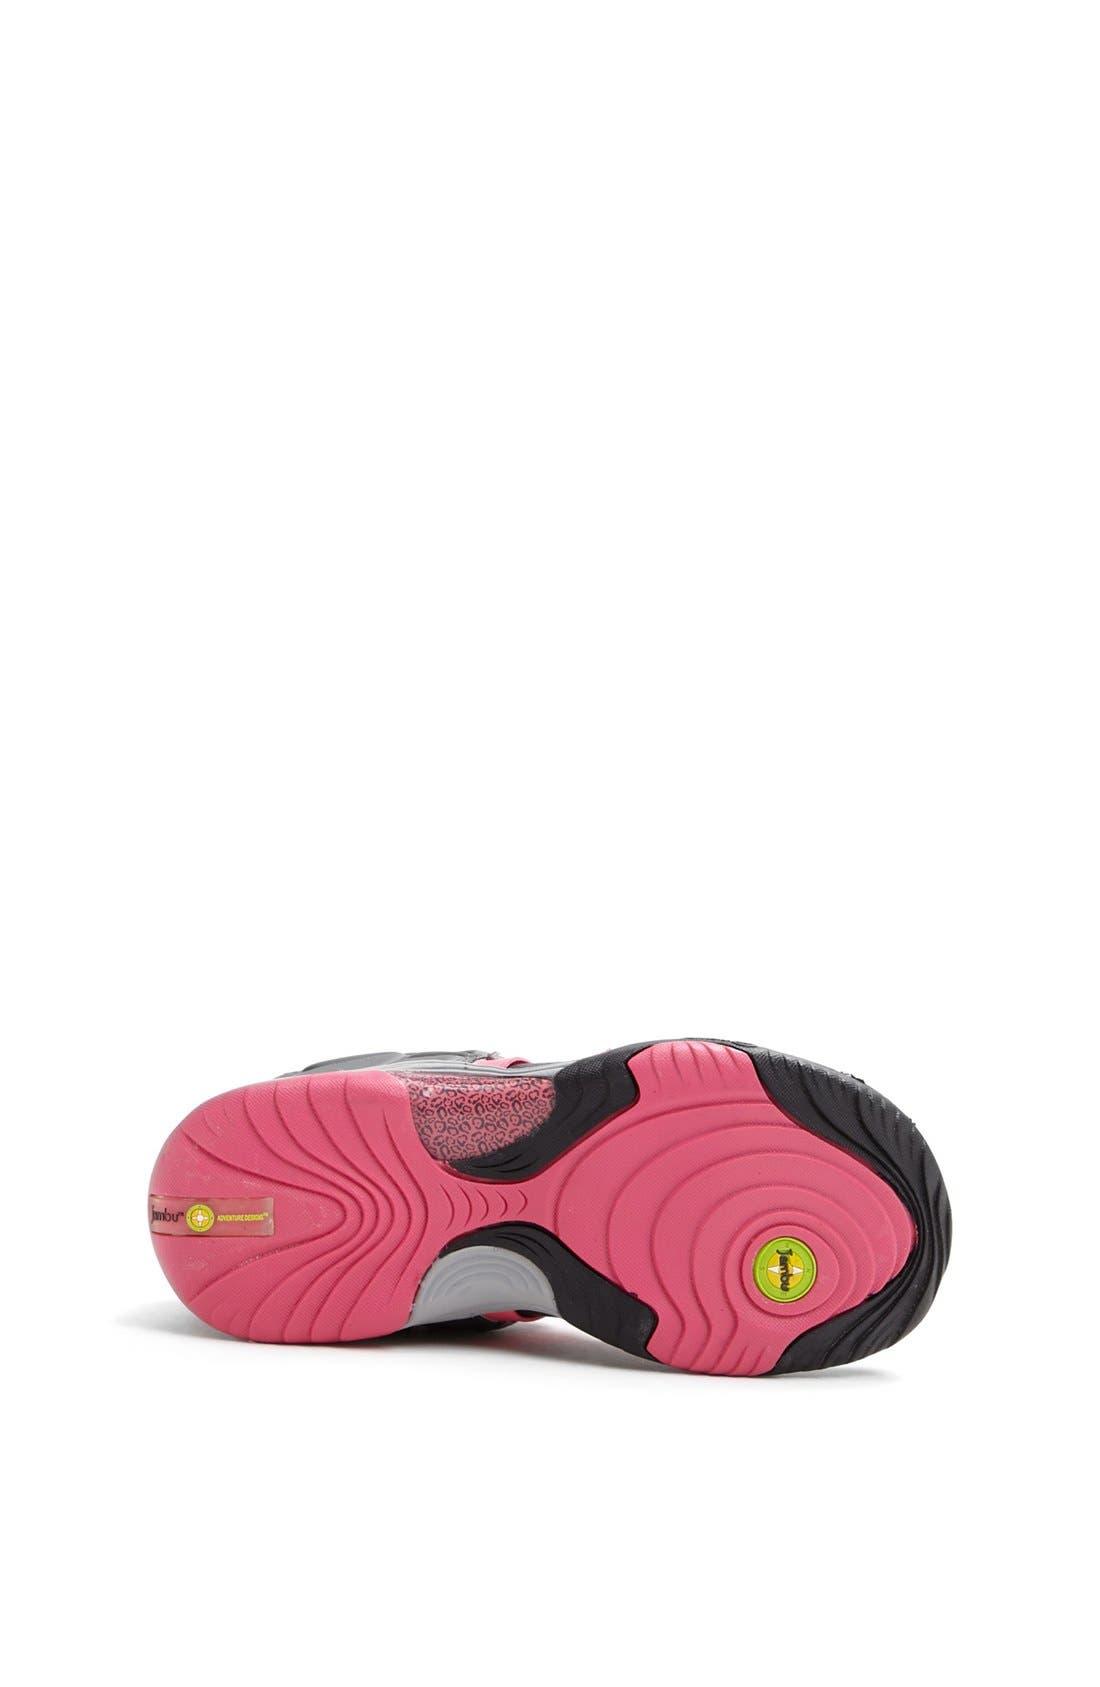 Alternate Image 3  - Jambu 'Agami' Sneaker (Toddler, Little Kid & Big Kid)